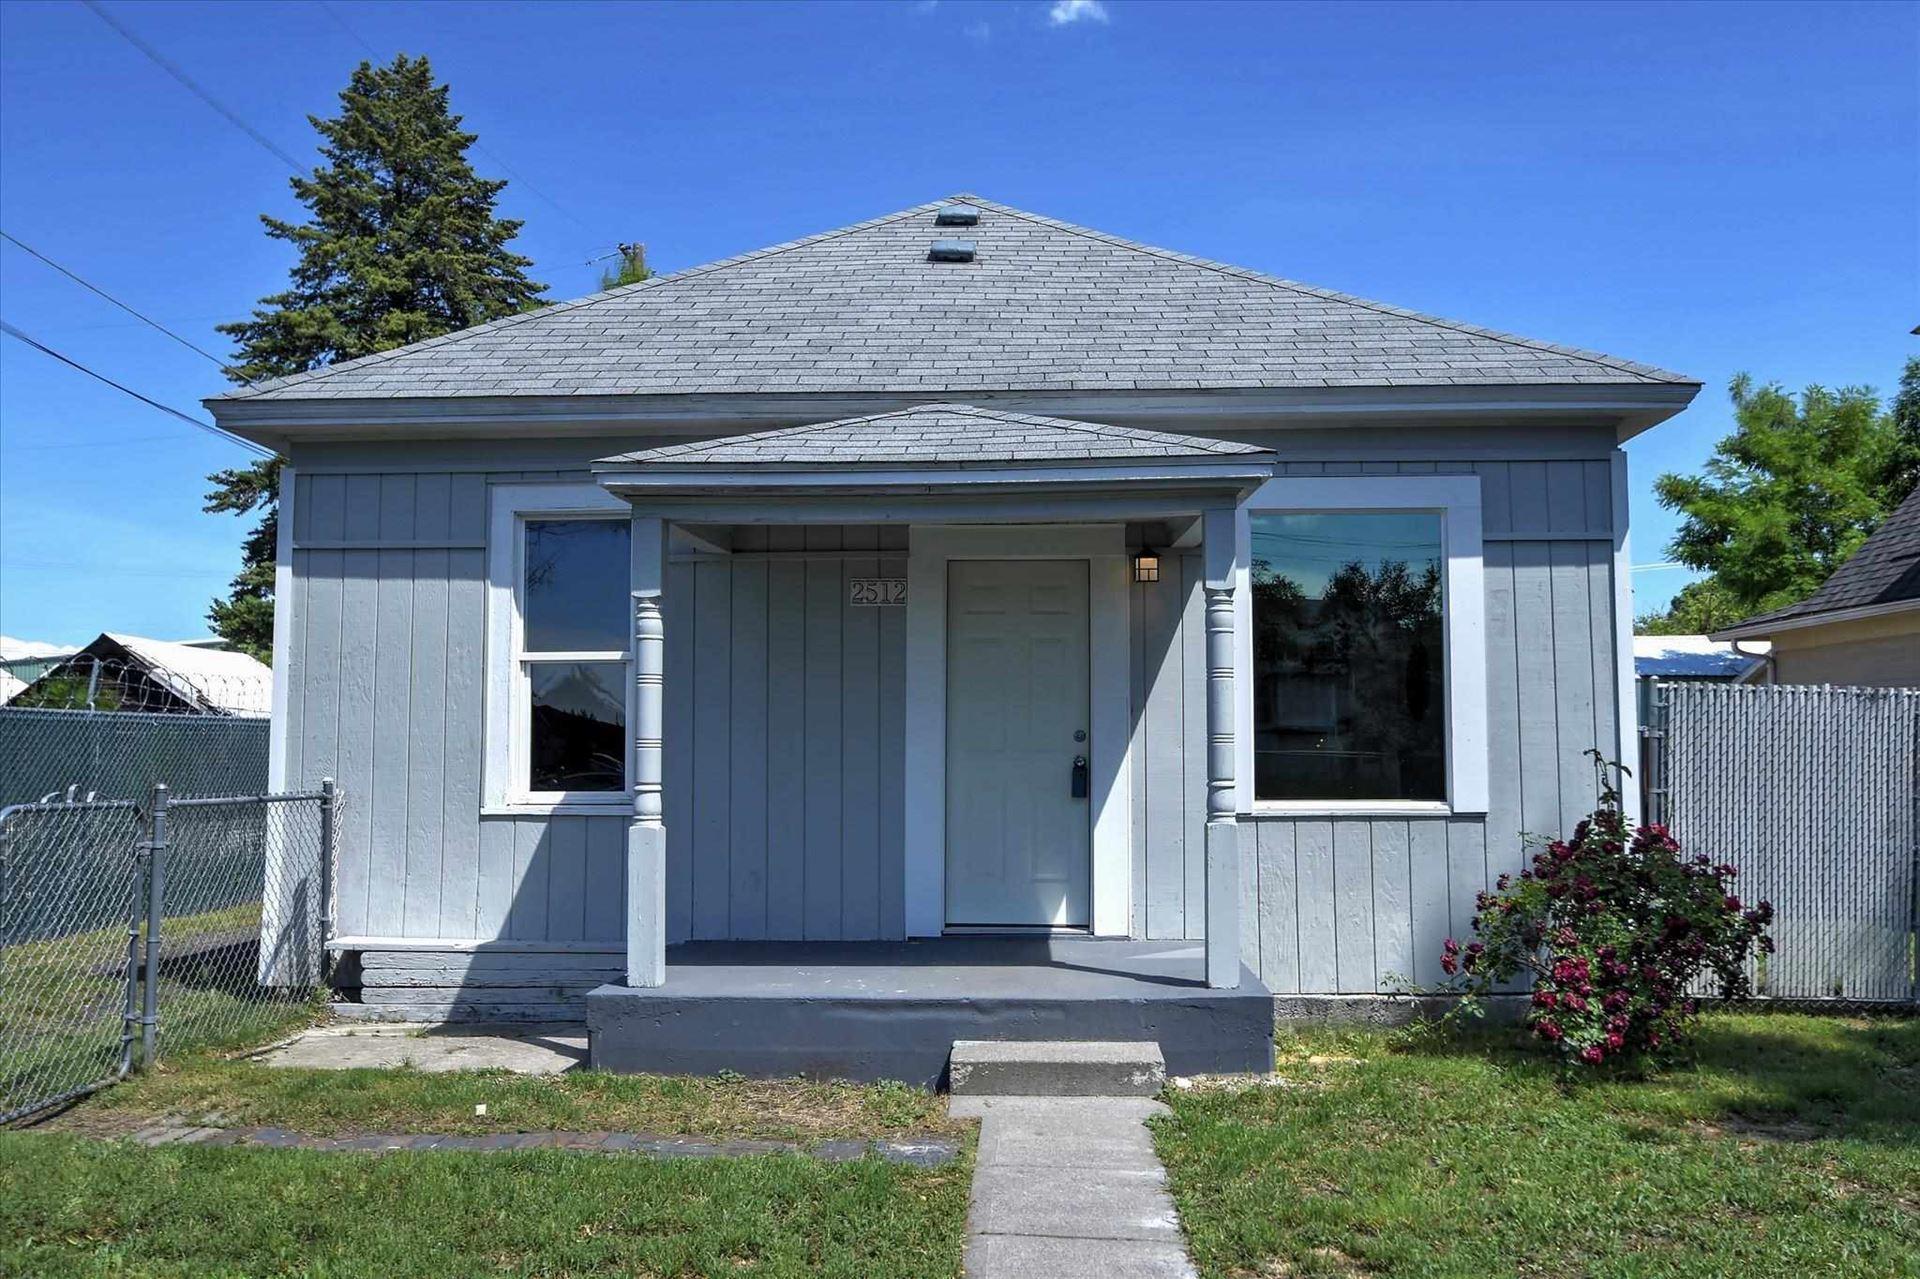 2512 N Standard St, Spokane, WA 99207 - #: 202120600